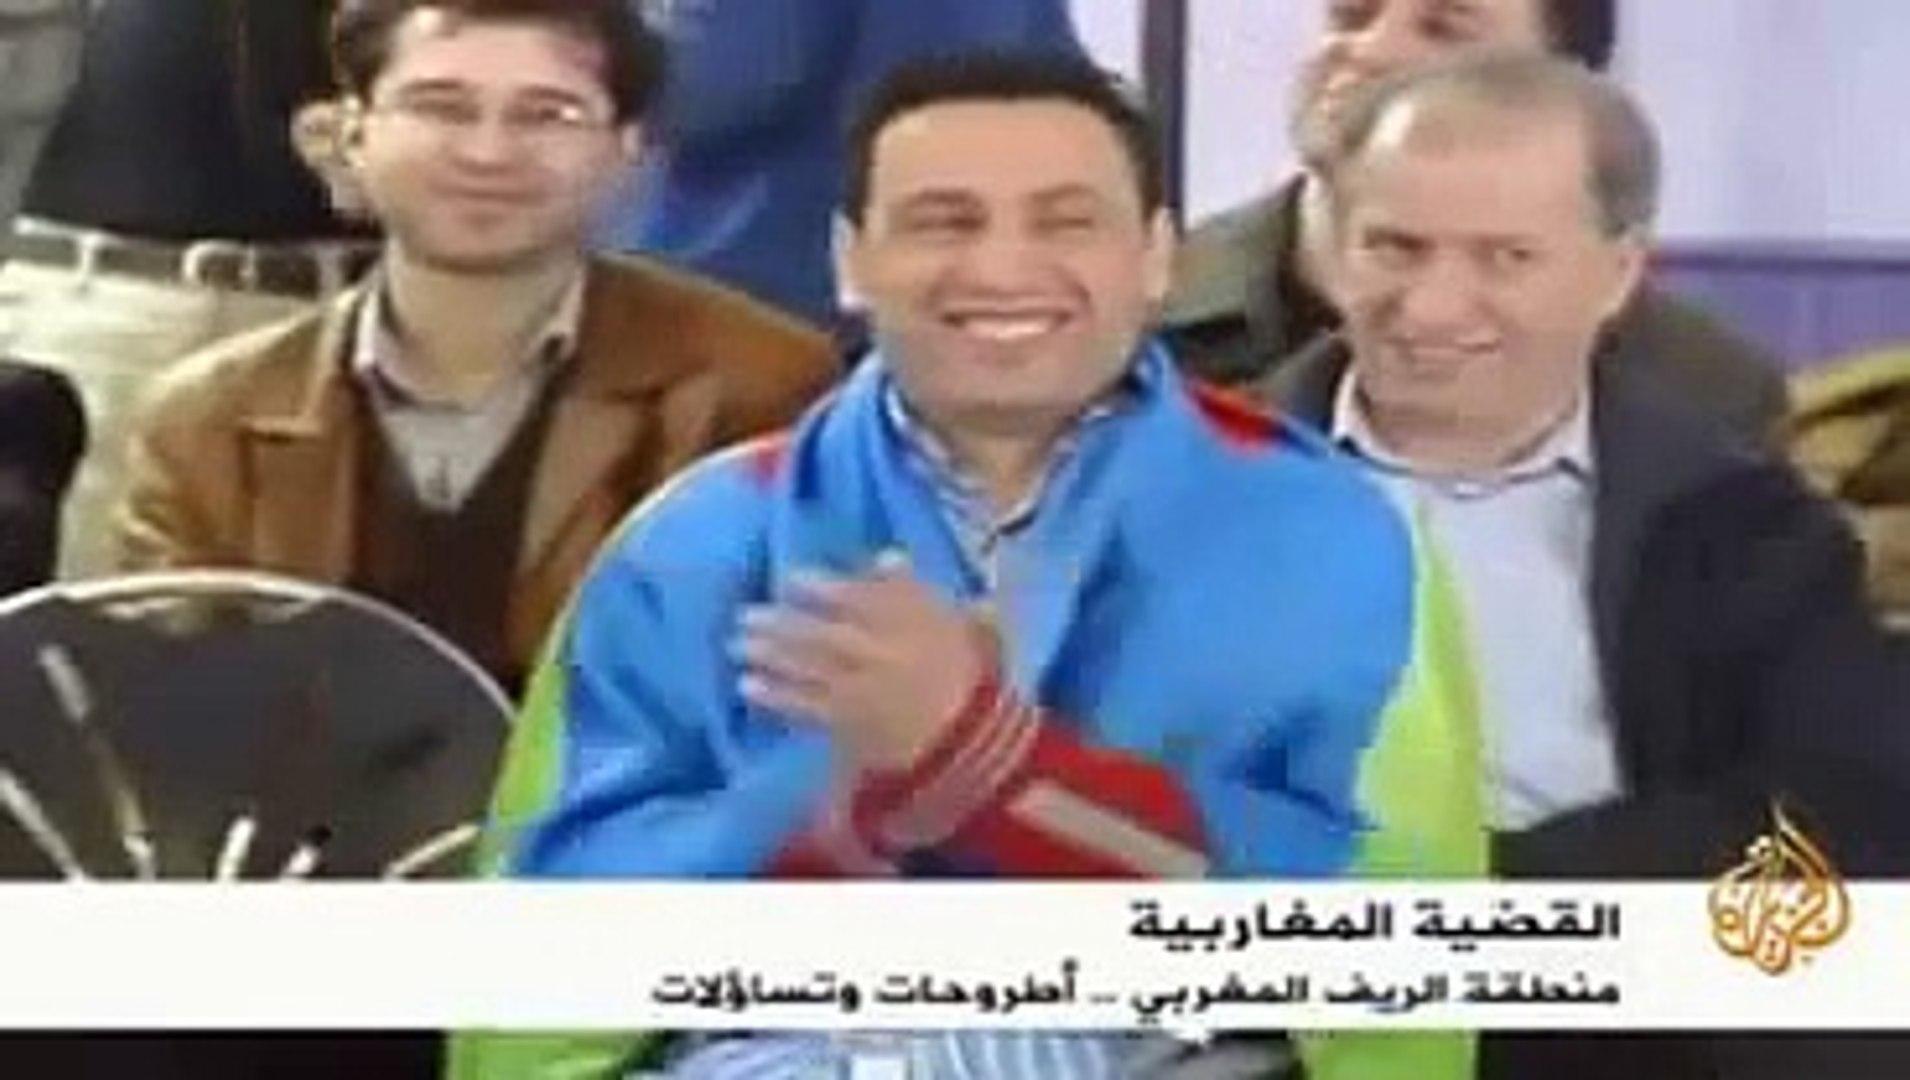 Aljazeera  الحكم الذاتي للريف شمال المغرب على قناة